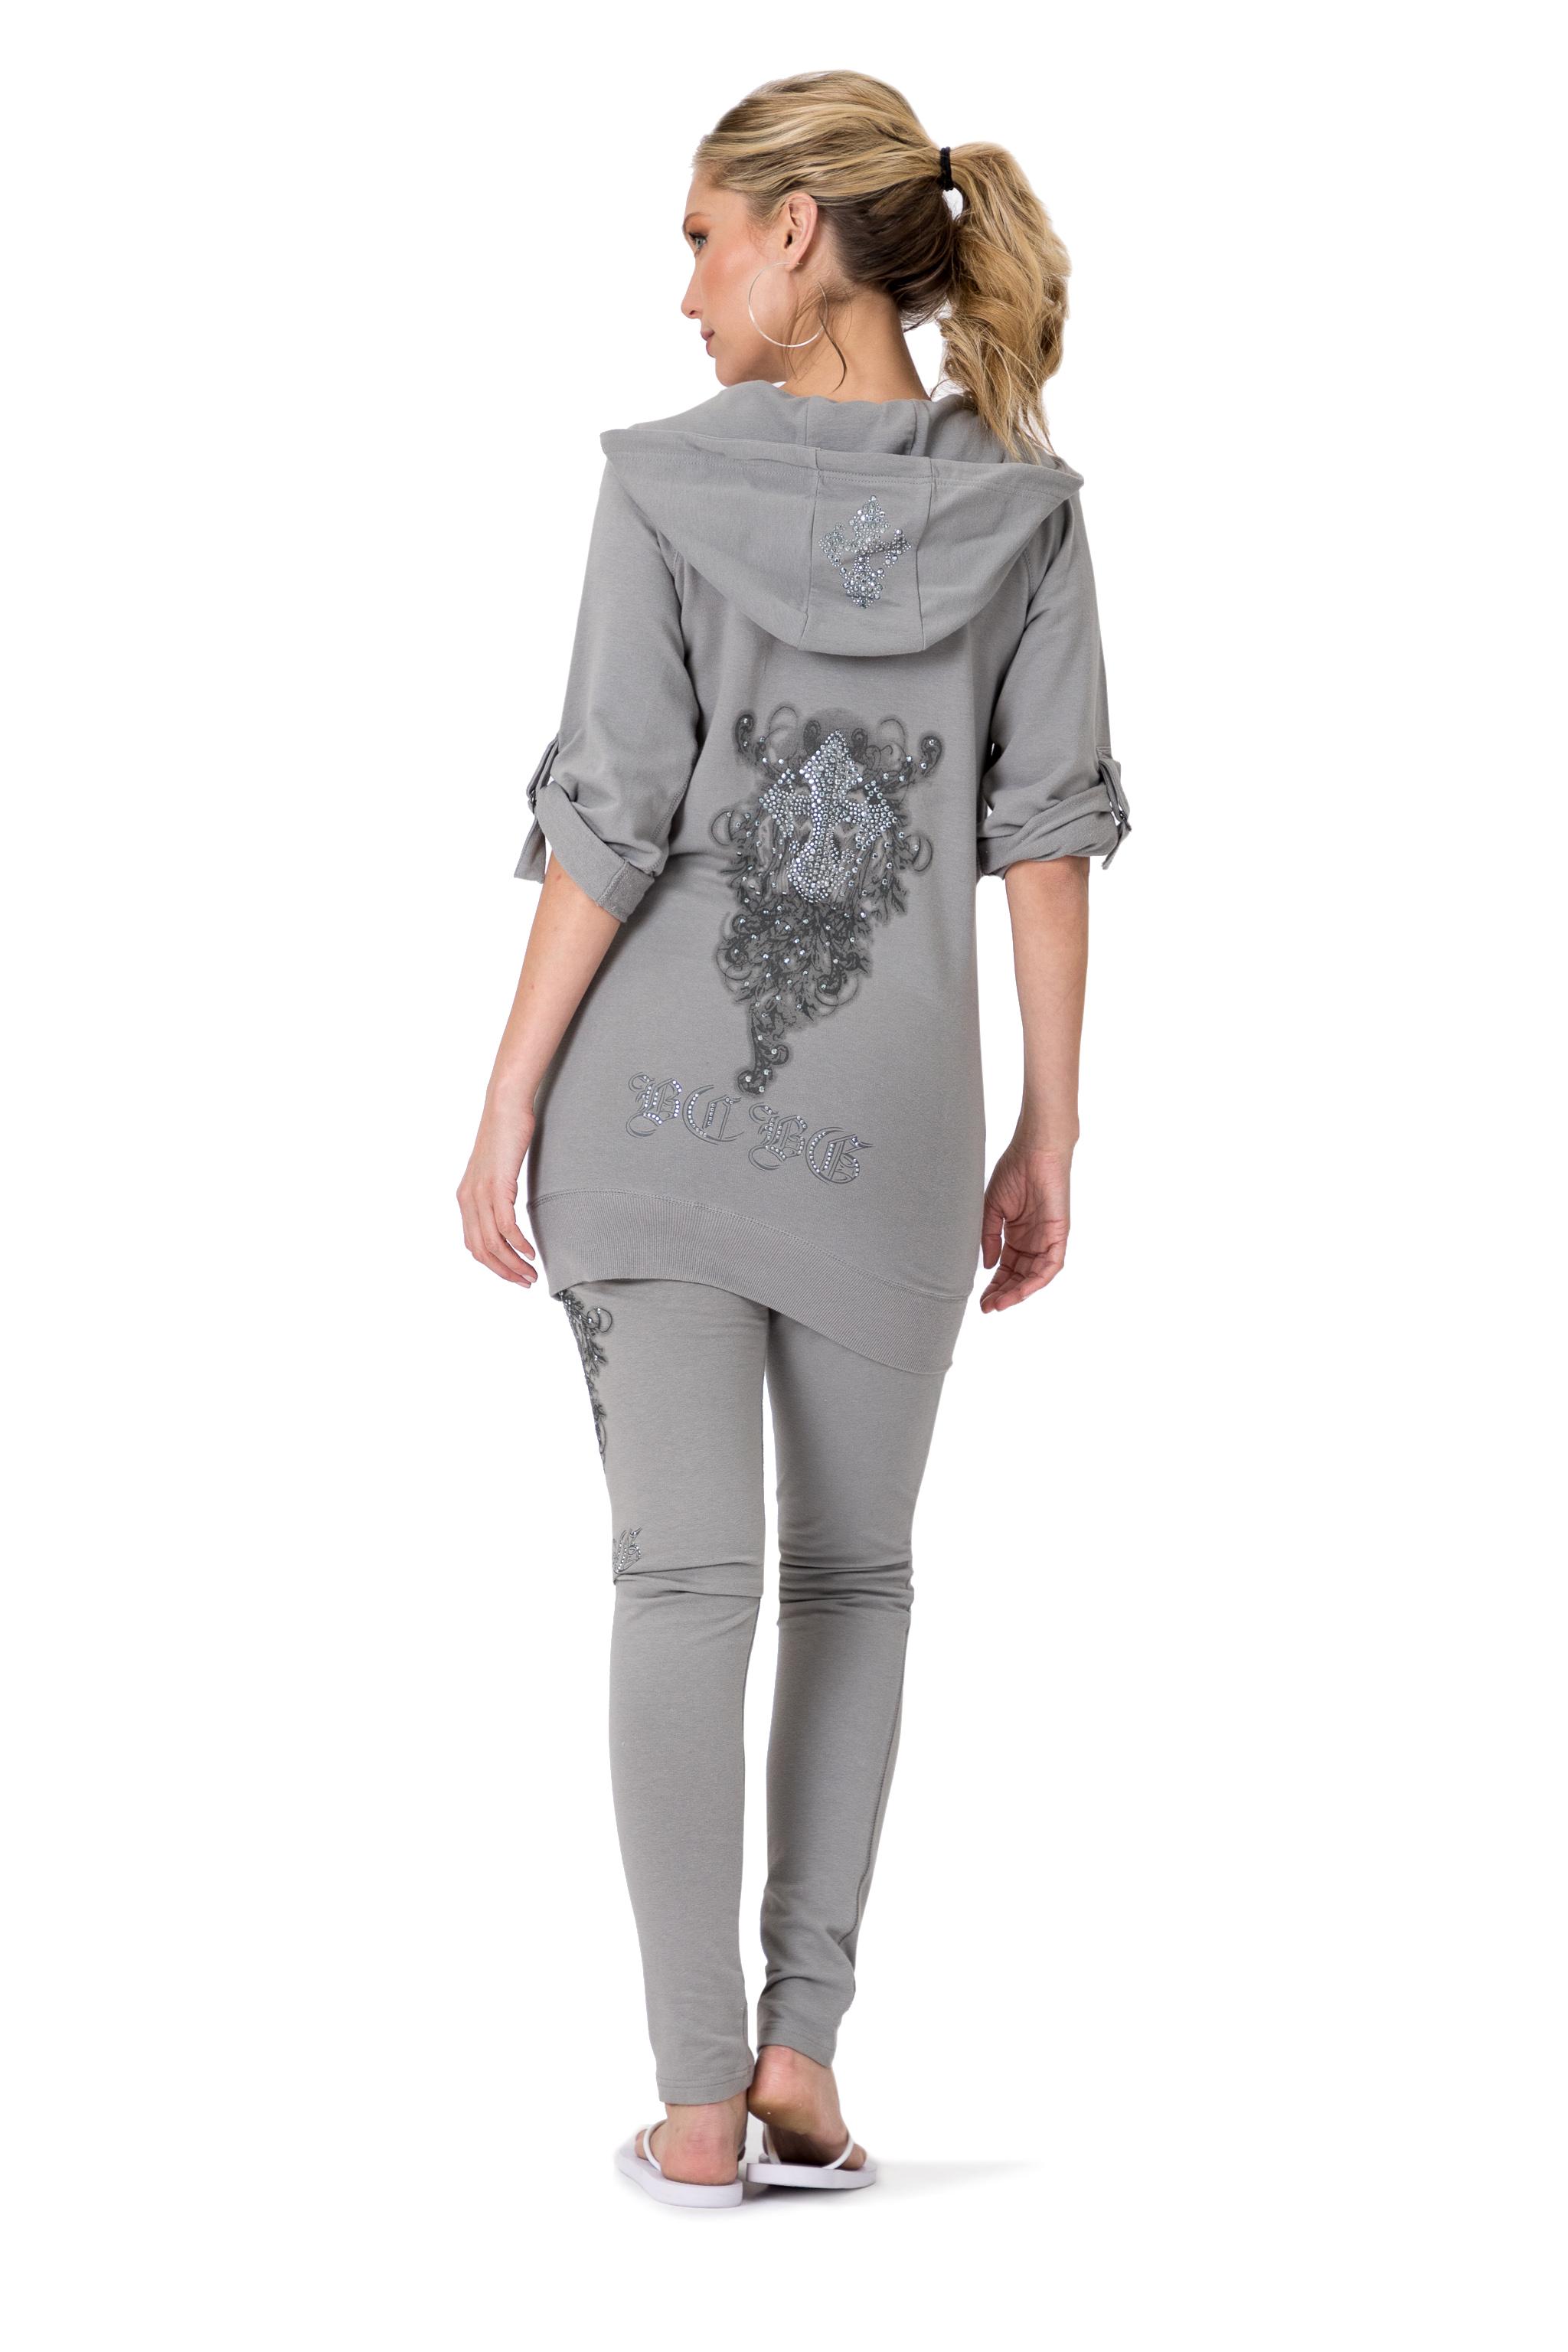 BCBG-Women-039-s-Lounge-Wear-2-Piece-Embellished-Jacket-and-Pants-Jogger-Set thumbnail 10